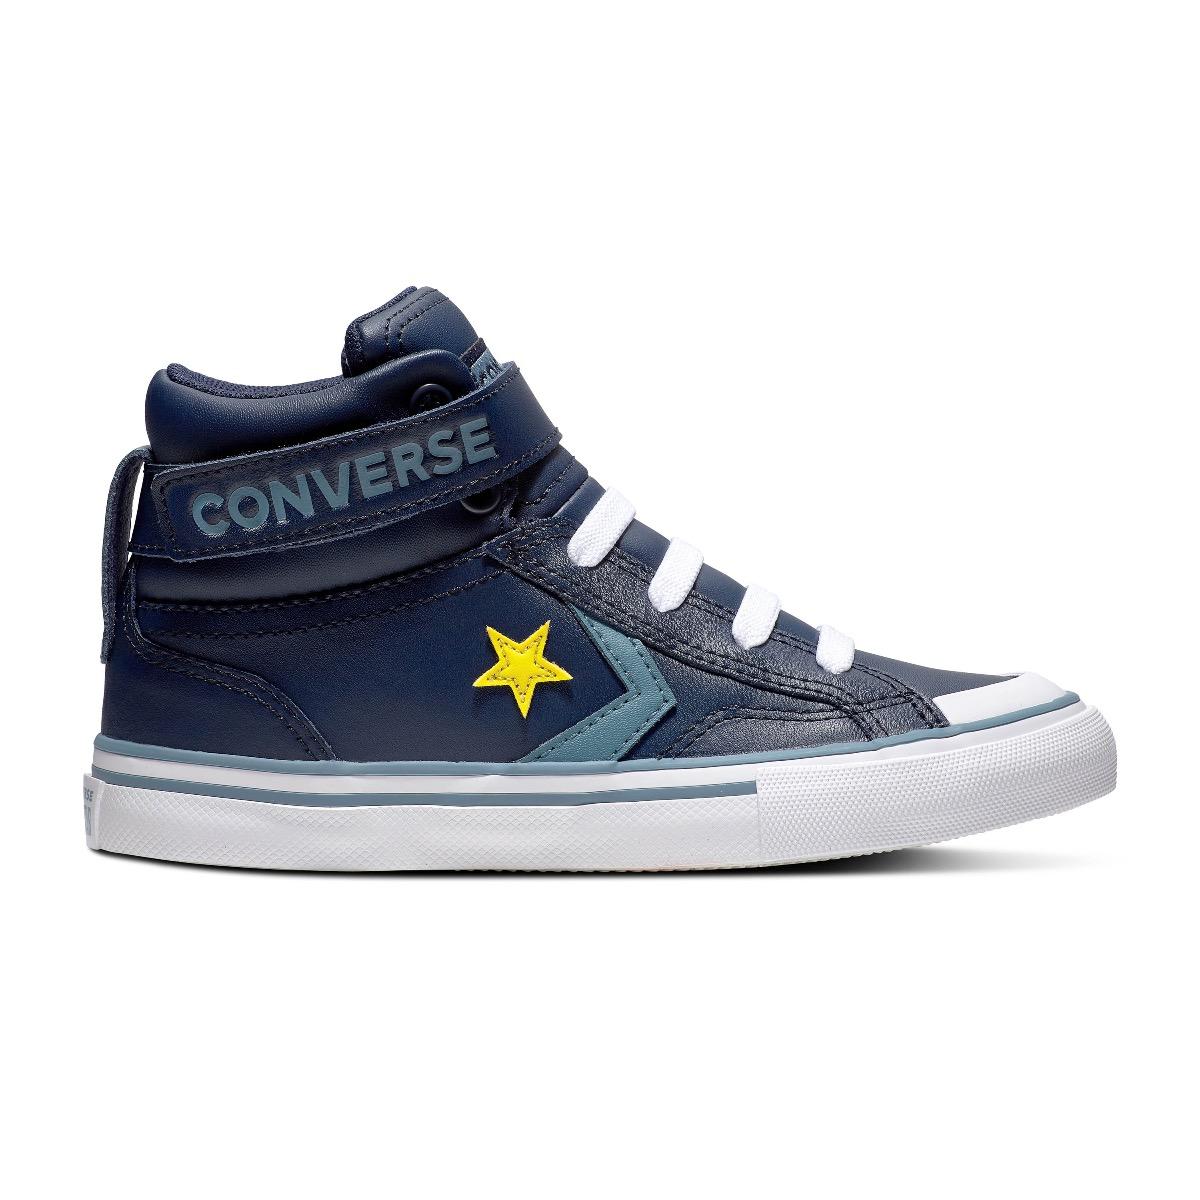 Converse All Stars Pro Blaze Strap 663607C Blauw